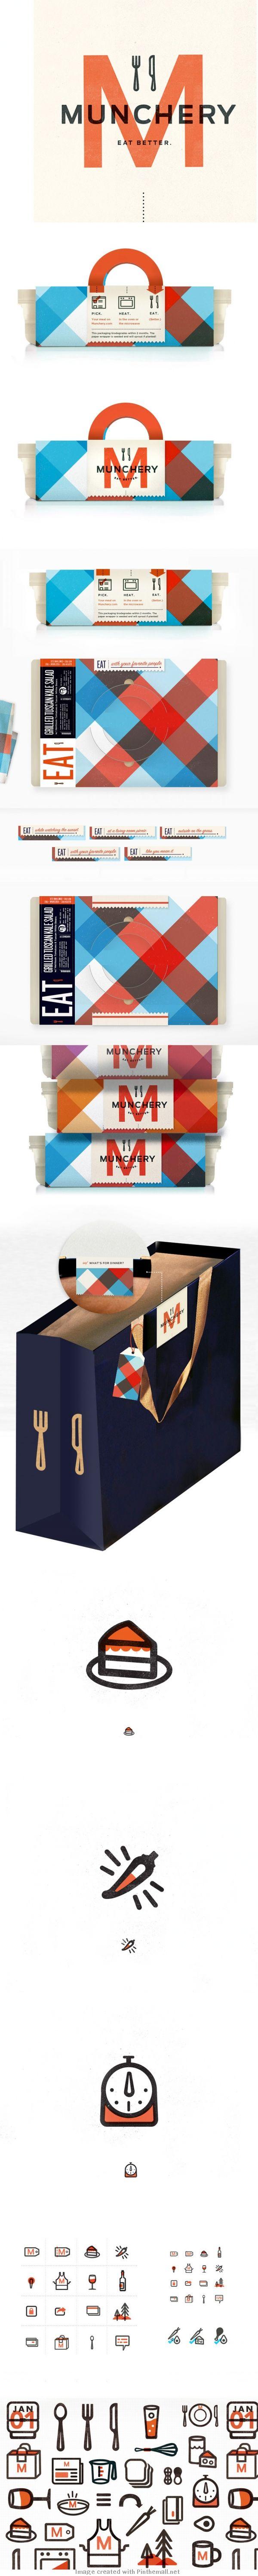 Munchery | Kelli Anderson | #stationary #corporate #design #corporatedesign #identity #branding #marketing < repinned by www.BlickeDeeler.de | Take a look at www.LogoGestaltung-Hamburg.de